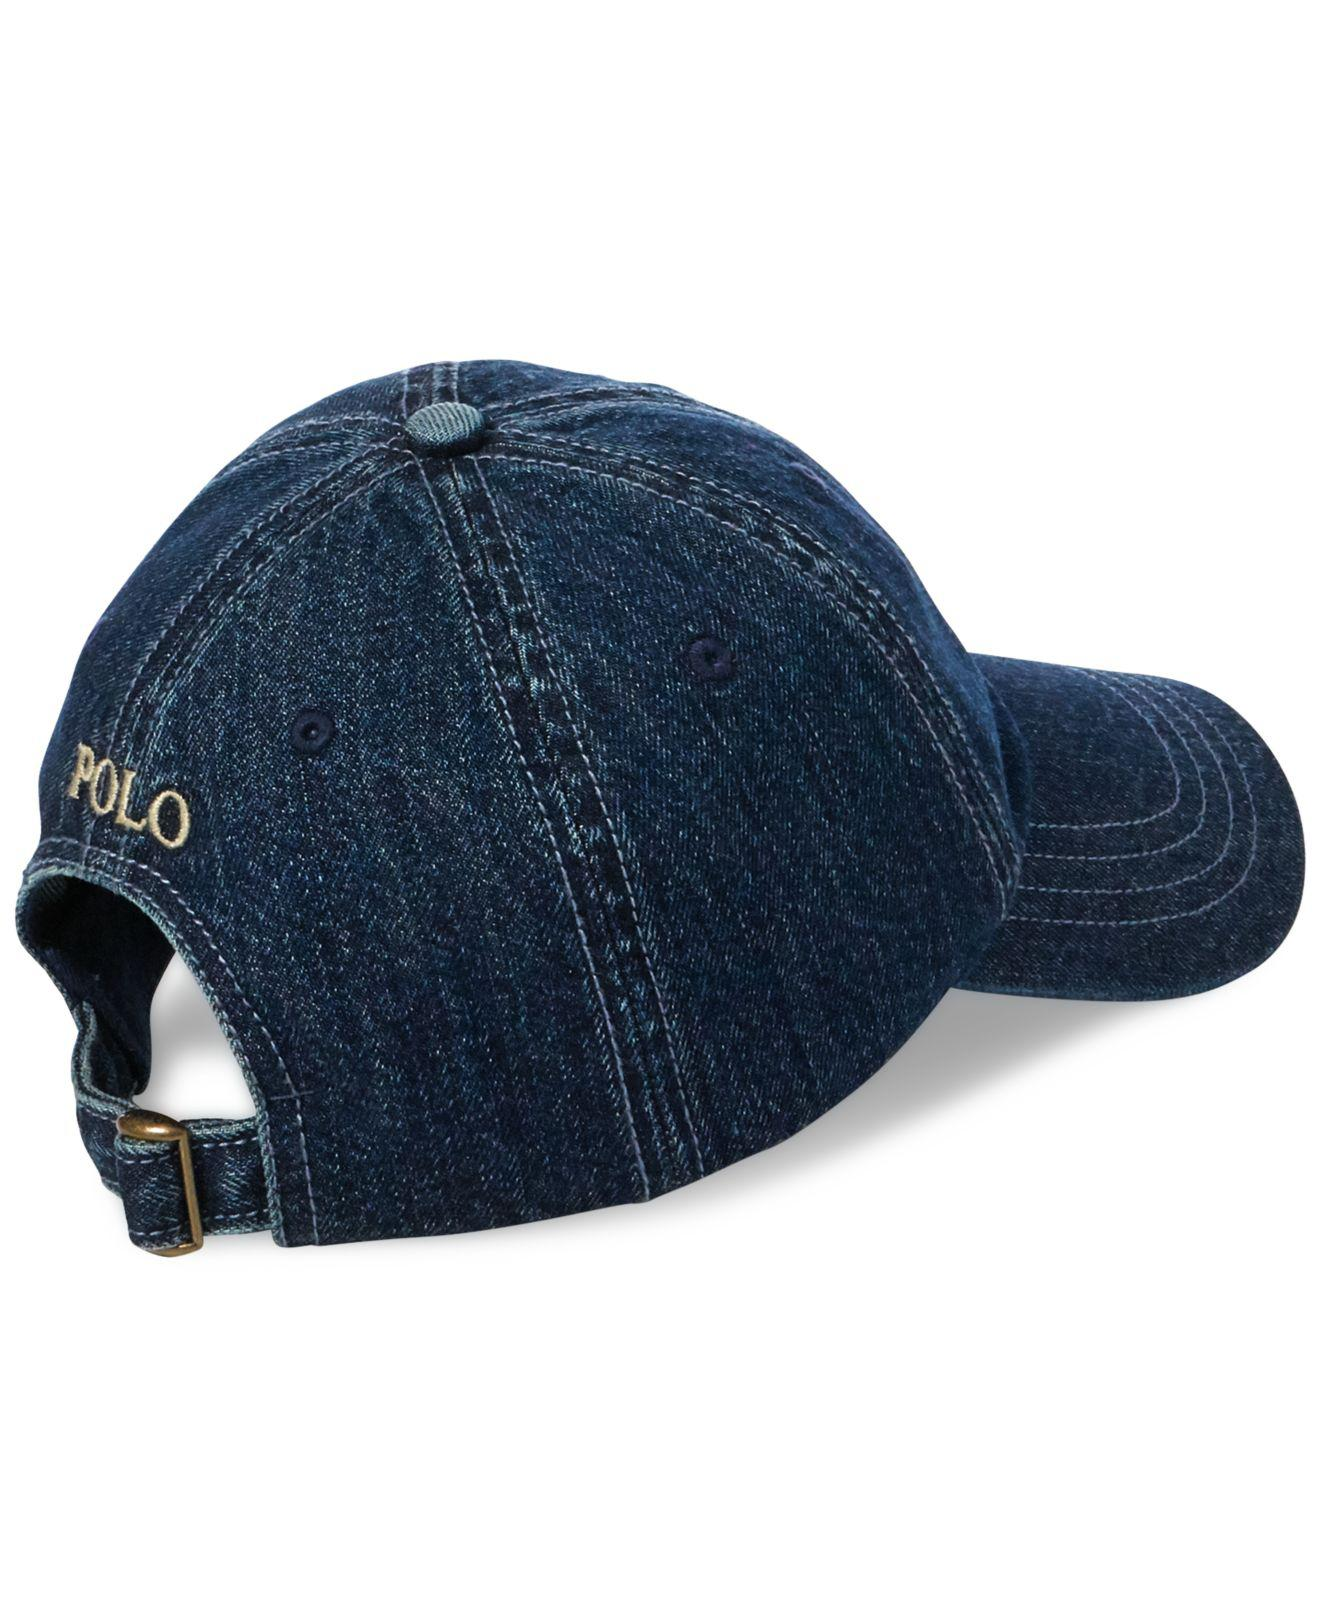 f735b263169 Polo  Lyst - Polo Ralph Lauren Denim Baseball Cap in Blue for Men 50% price  51786  Reversible Chino Bucket Hat ...